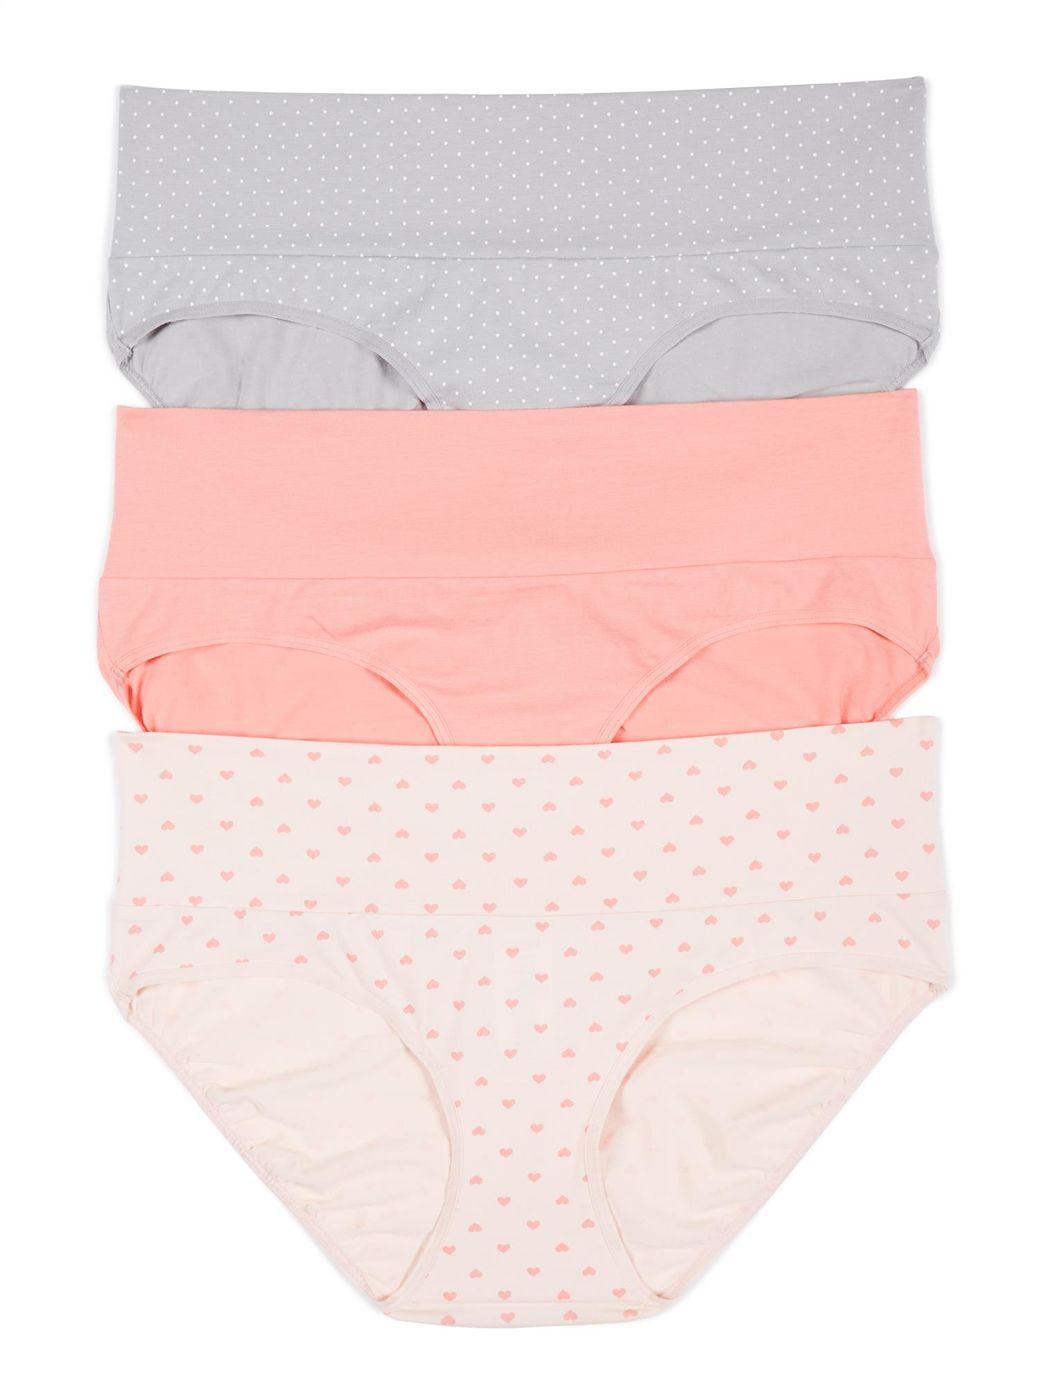 cfe21ab7de556 Maternity Shirt Amazon